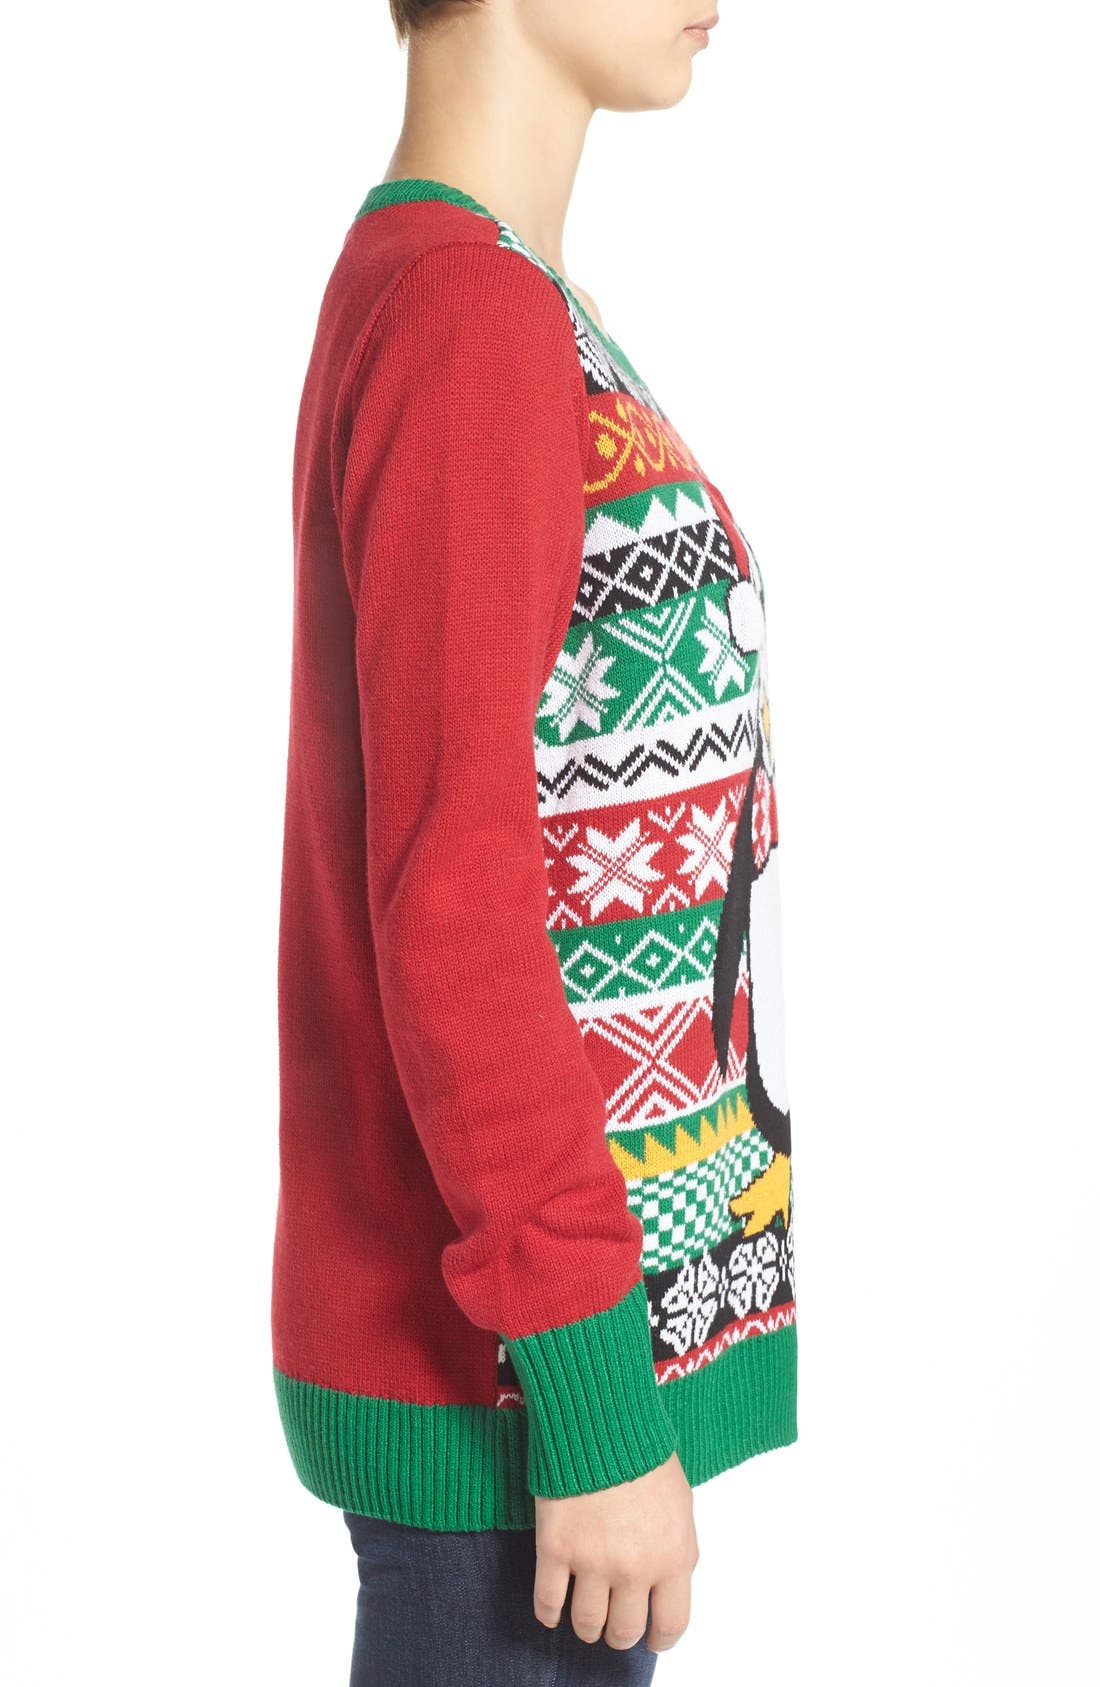 Alternate Image 3  - Ugly Christmas Sweater 'Penguin' Light-Up Fair Isle Knit Sweater